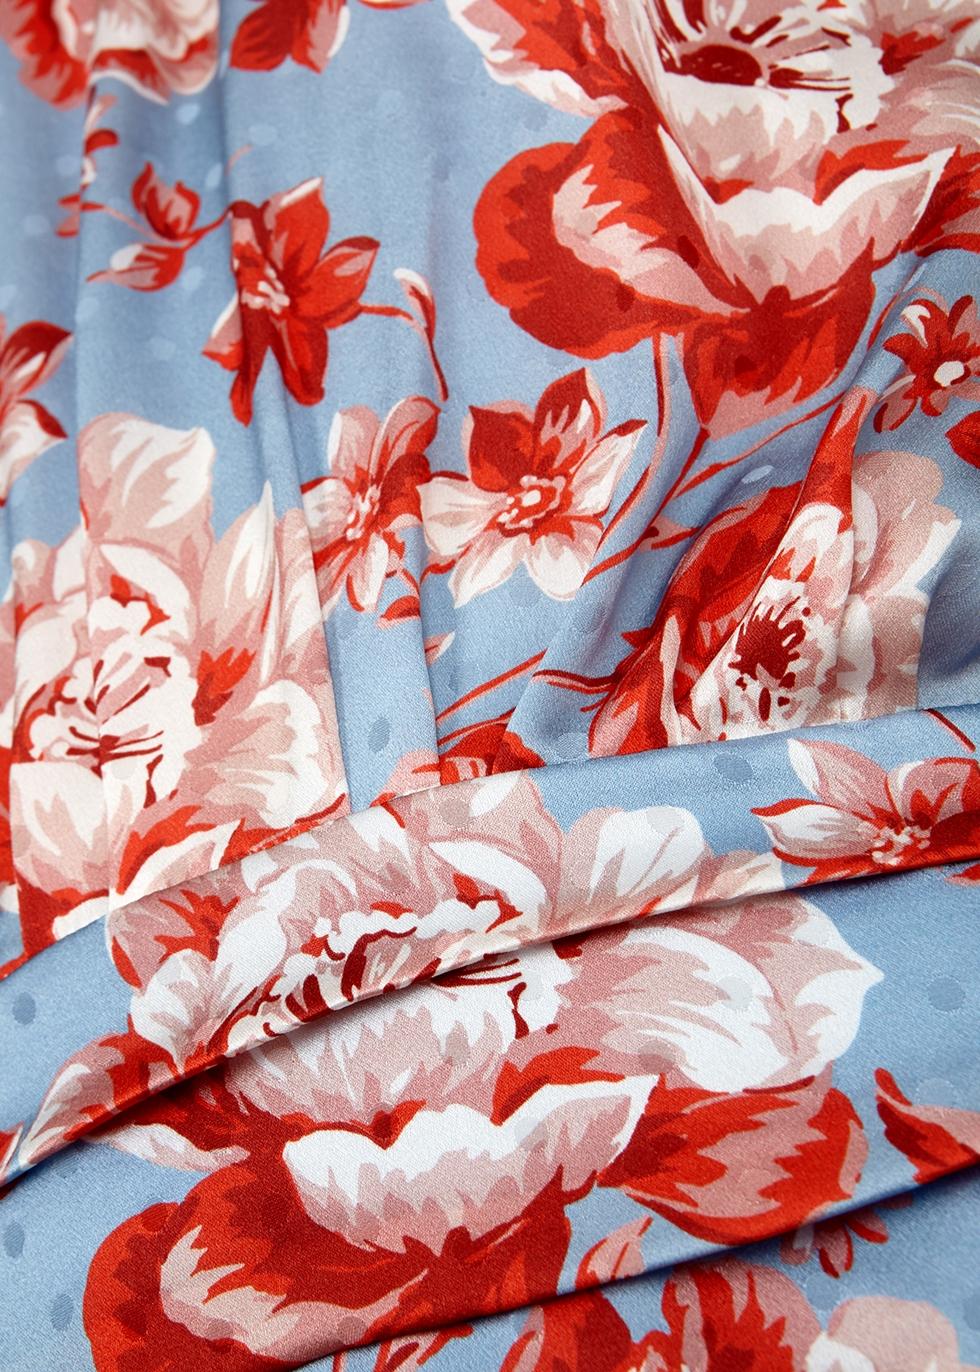 Setubal floral-print silk dress - Magda Butrym